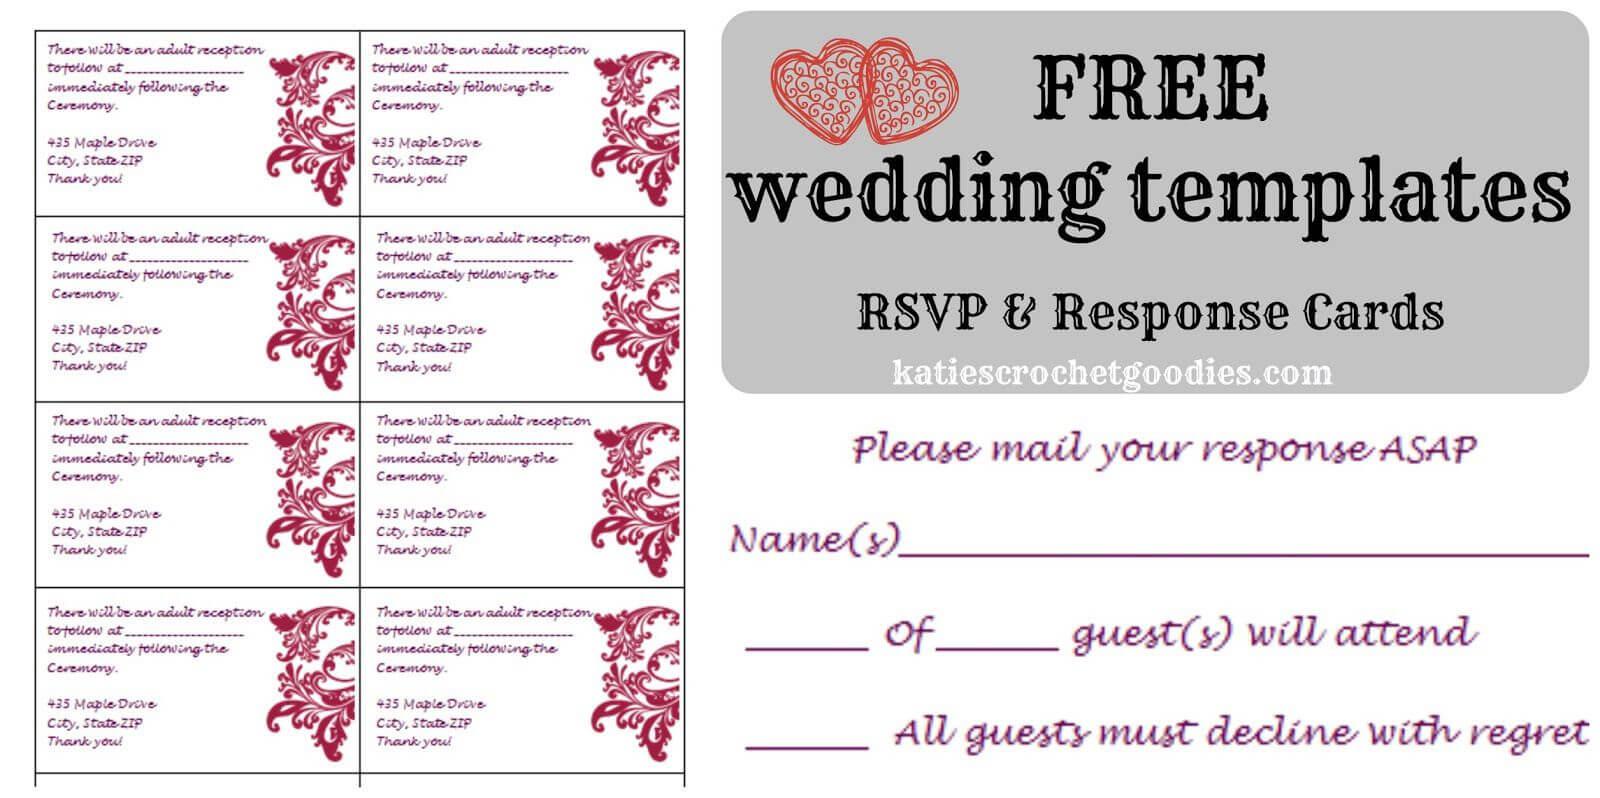 Free Wedding Rsvp & Response Card Template Templat | Wedding For Free Printable Wedding Rsvp Card Templates